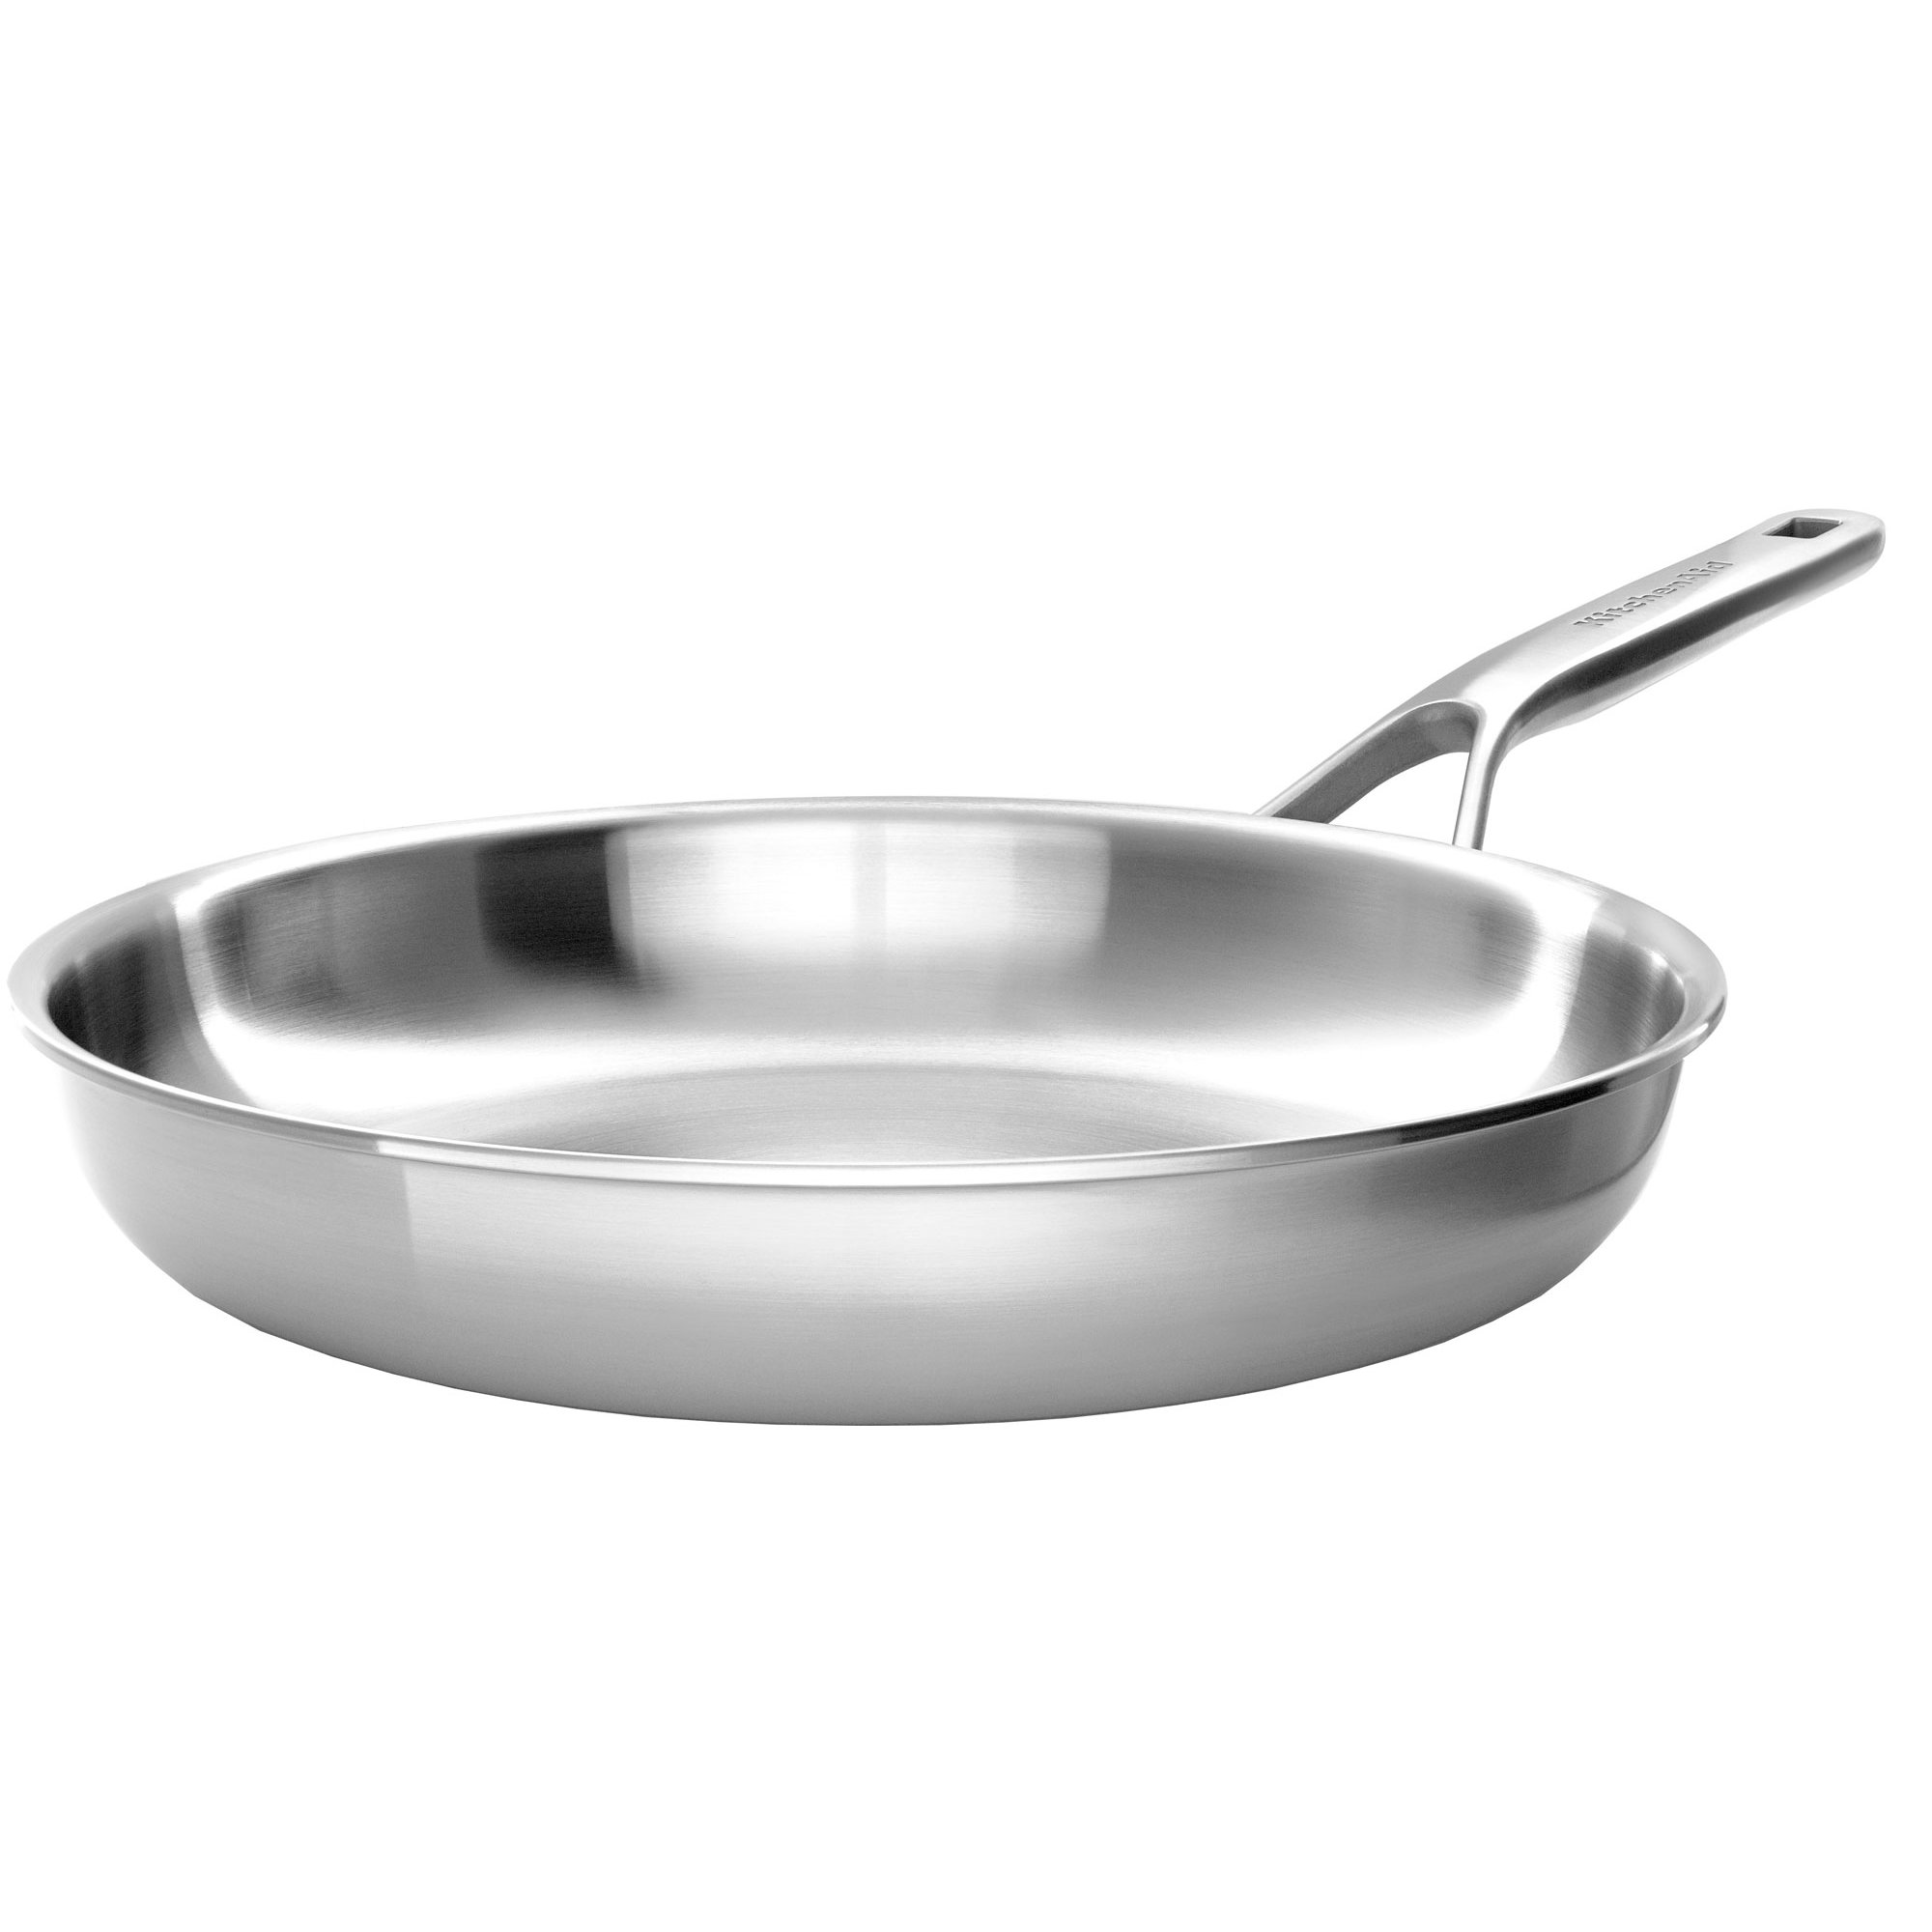 KitchenAid Cookware Collection Stekpanna silver 28 cm